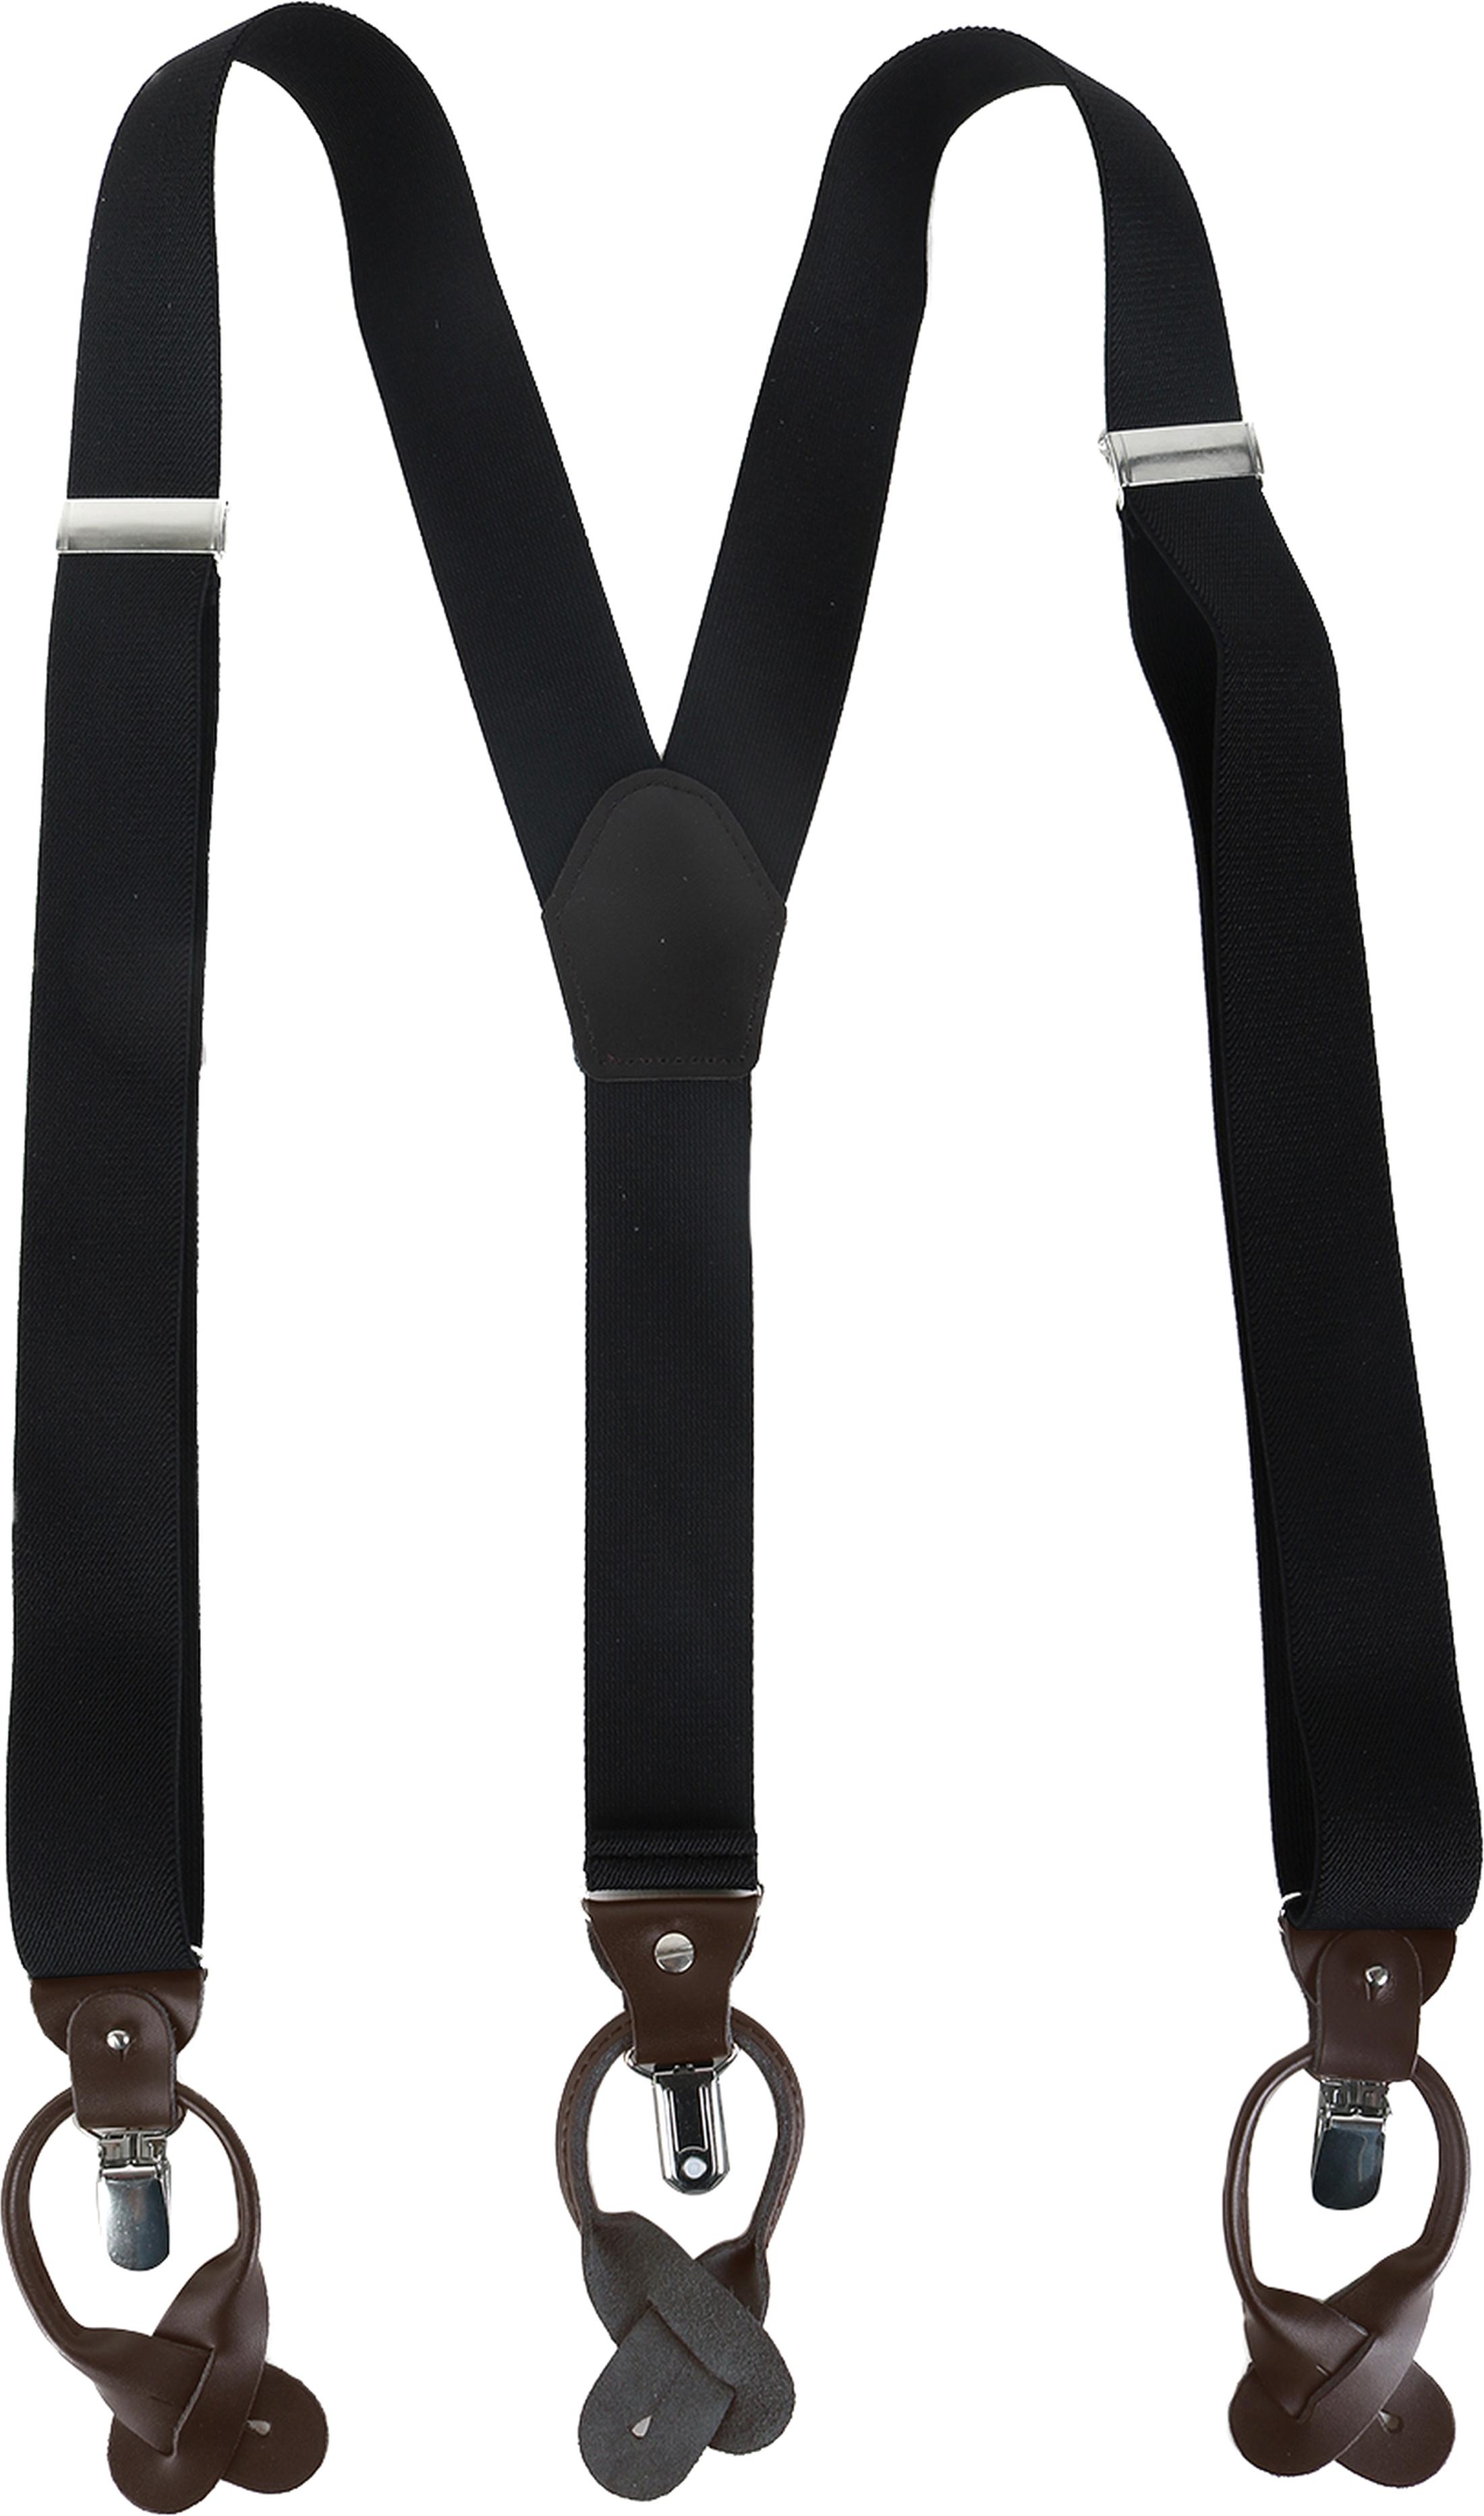 Black Suspenders foto 1